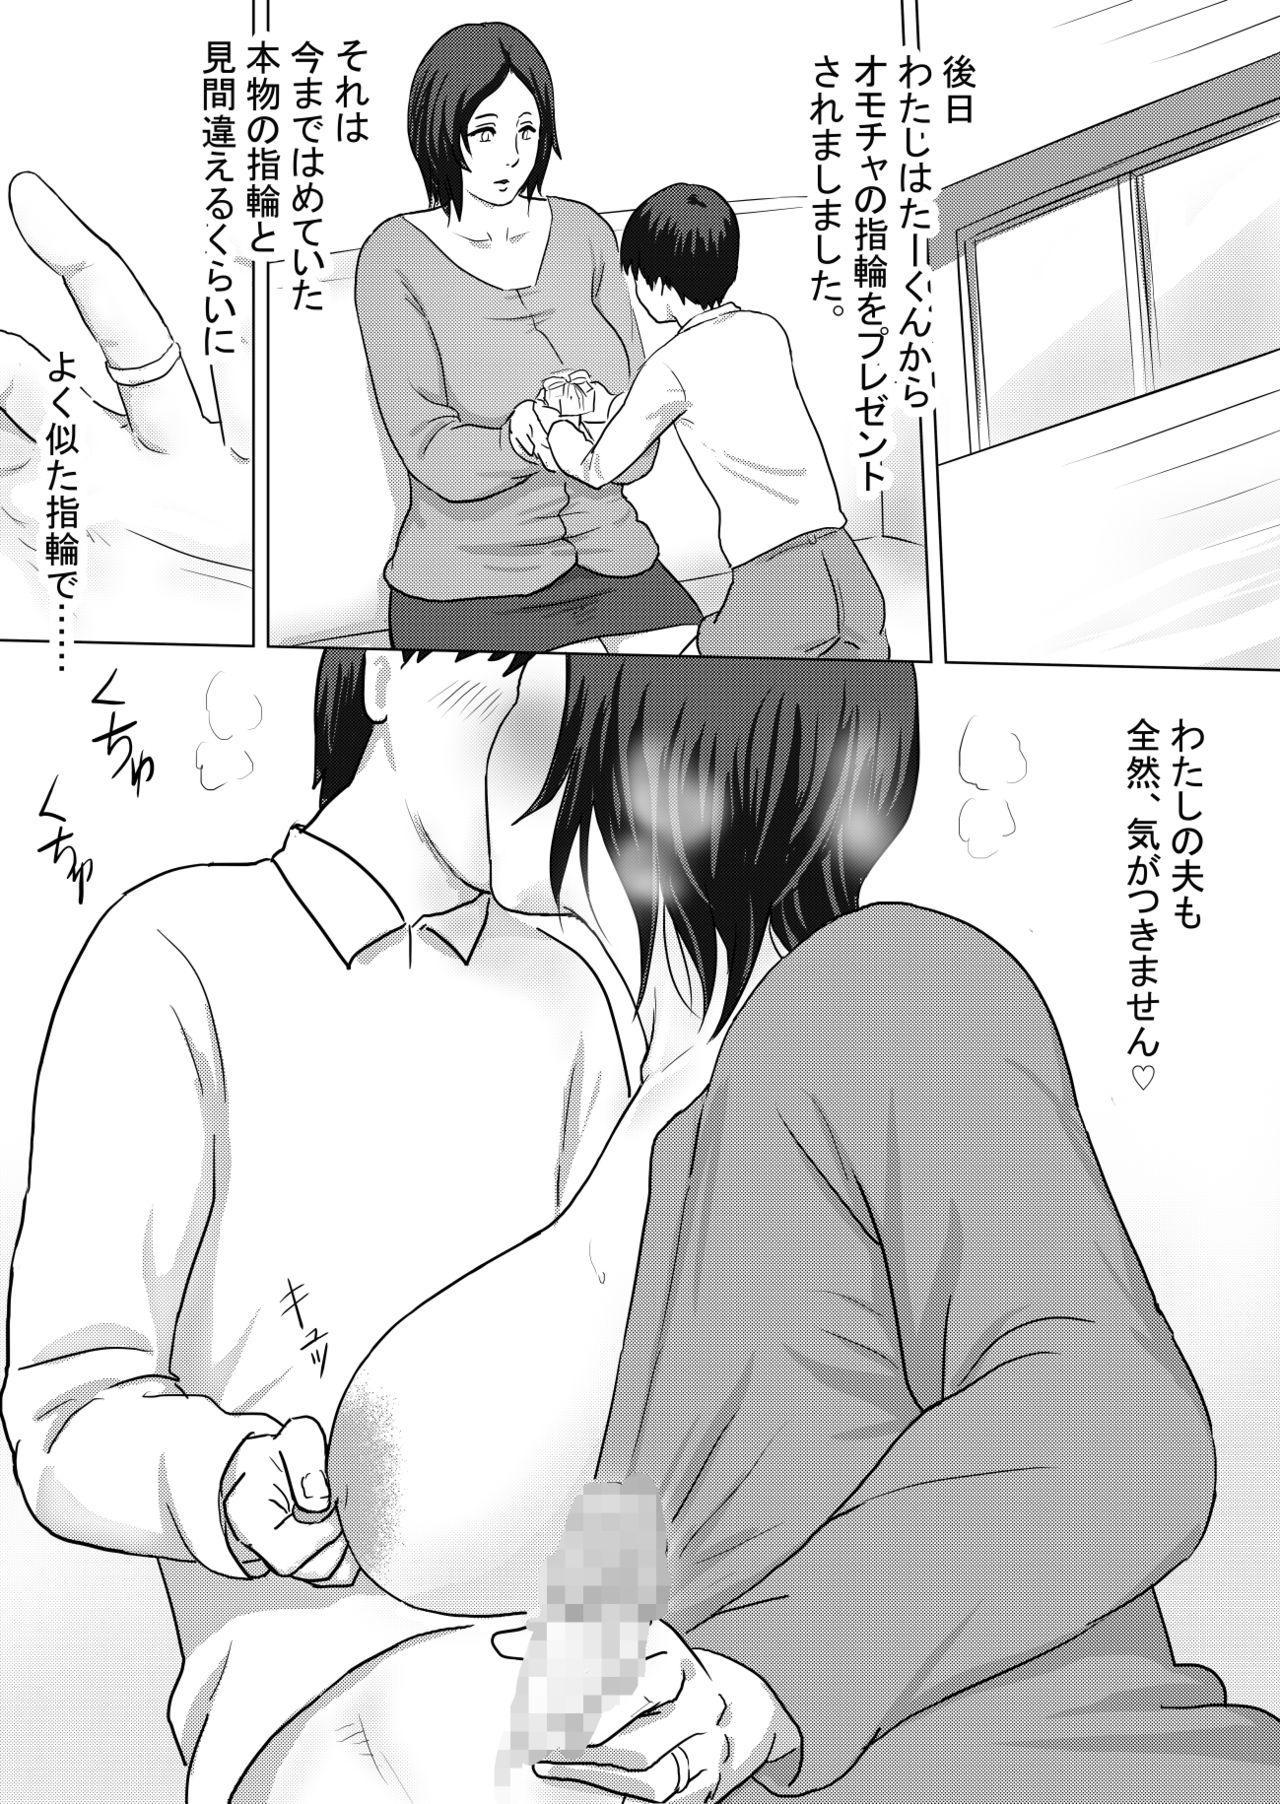 [Vulcan Nure] Mii-chan to Taa-kun 49